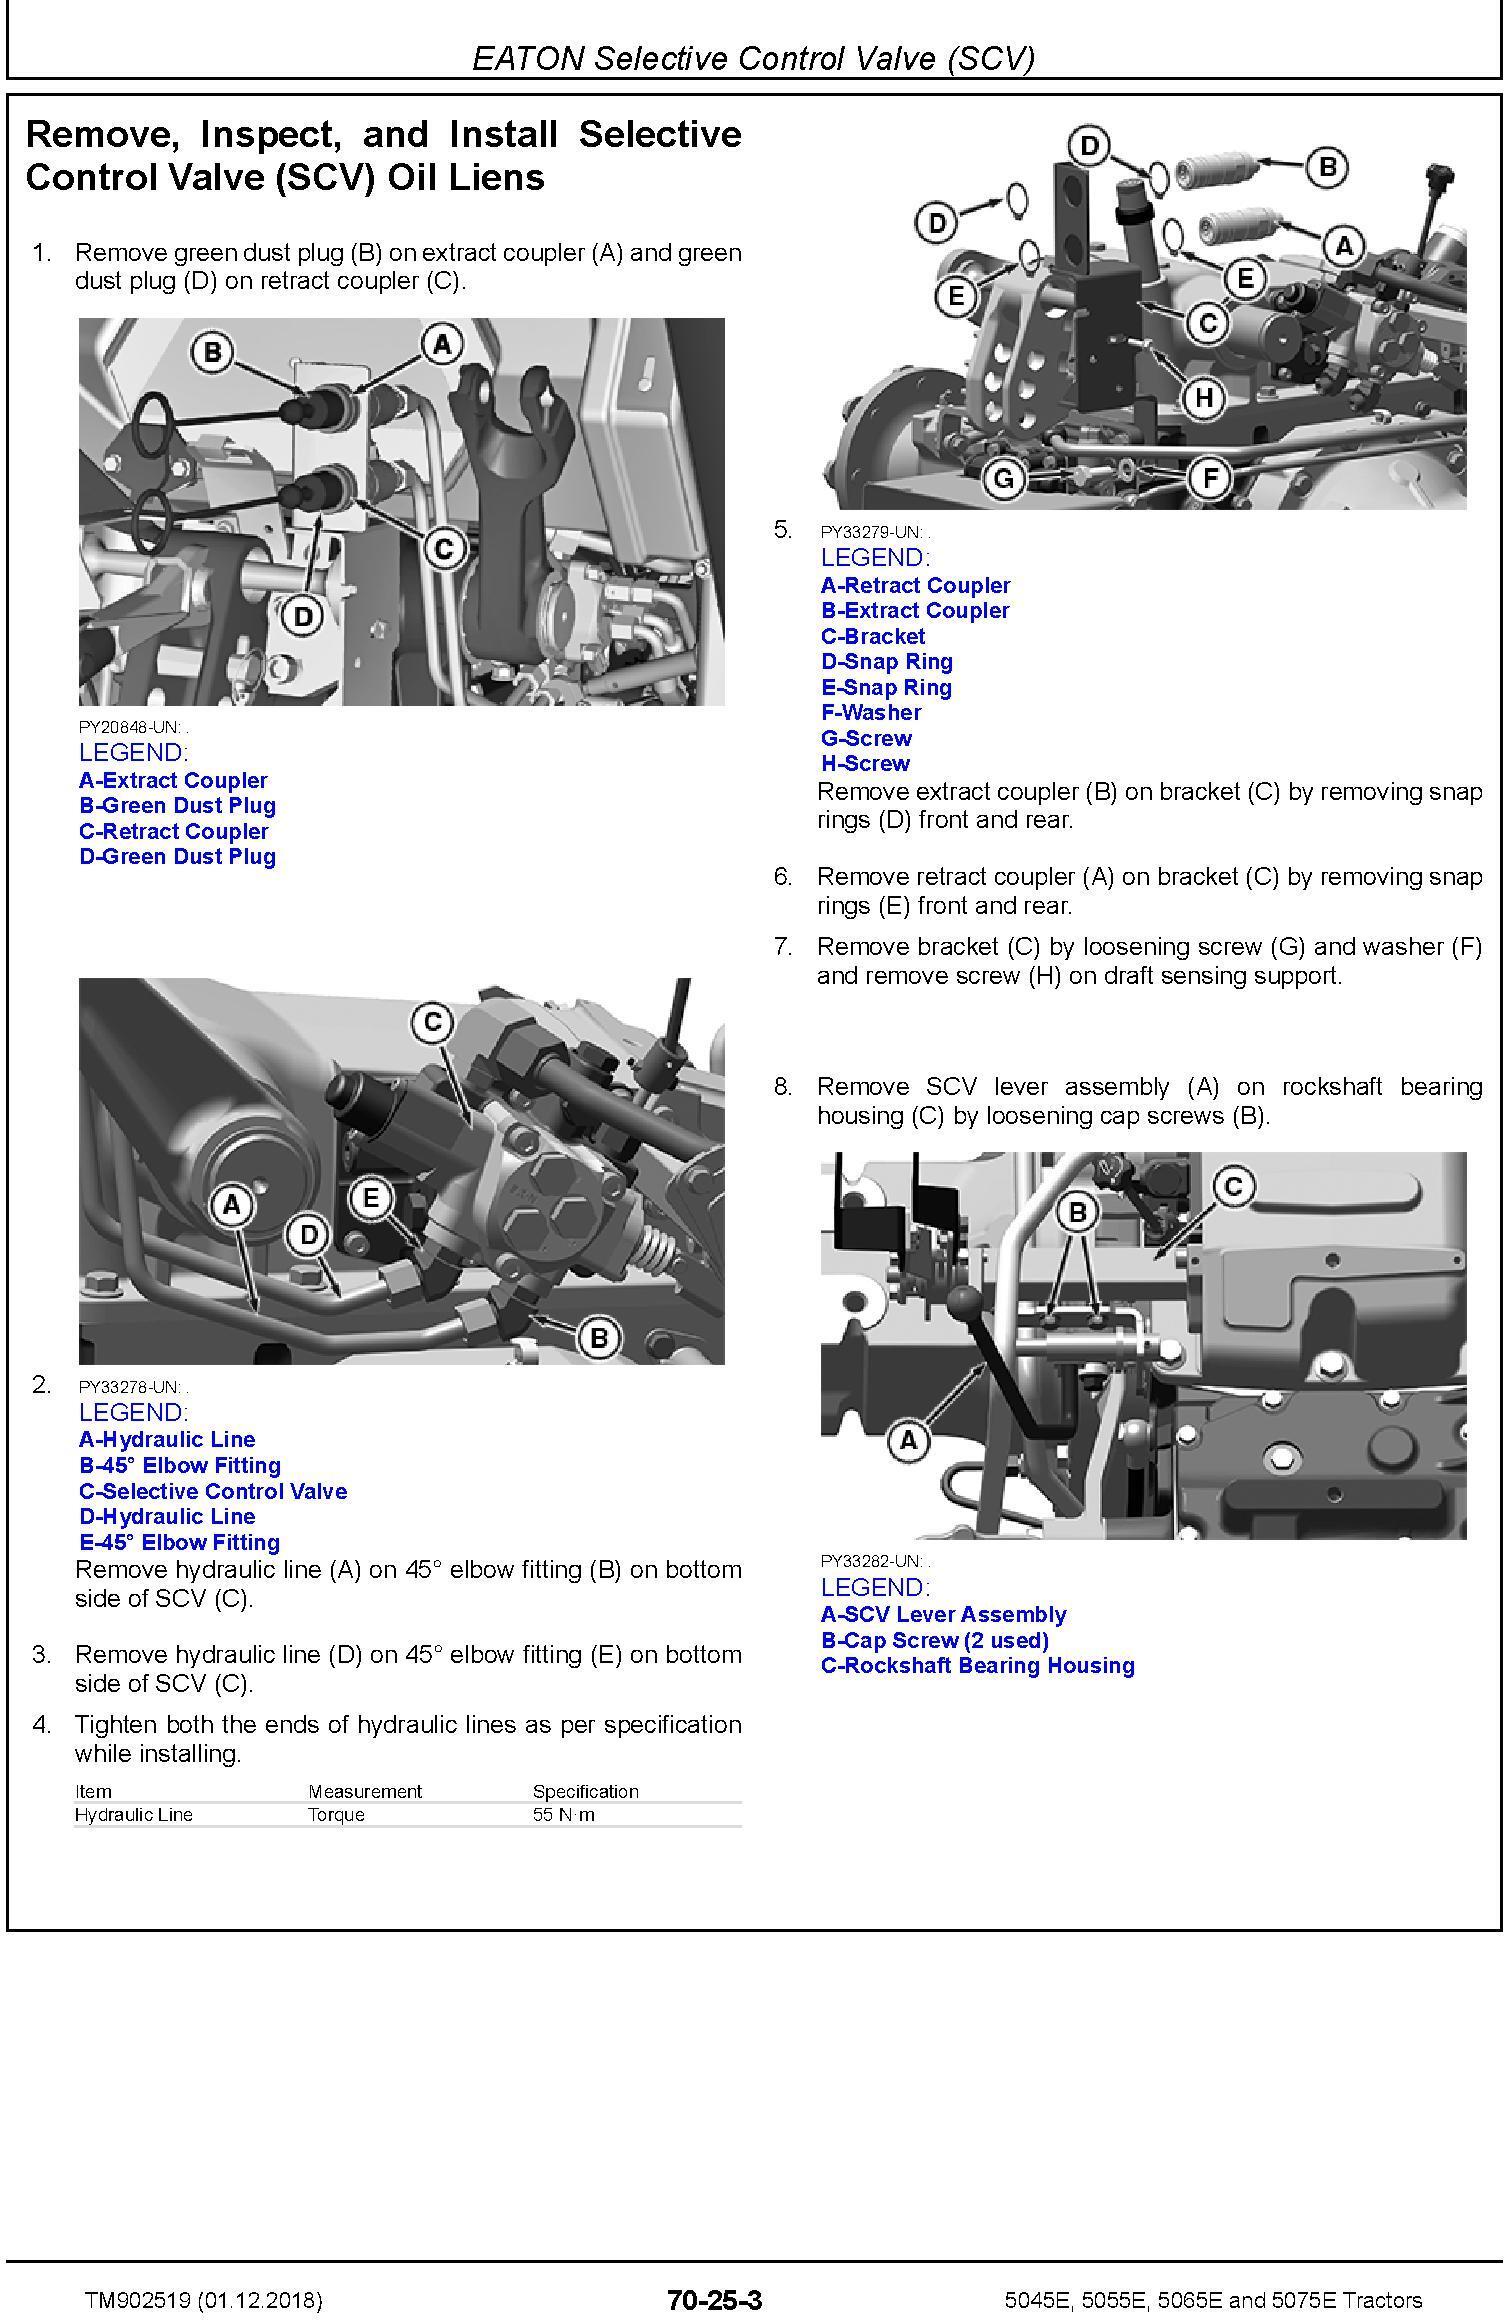 John Deere 5045E, 5055E, 5065E, 5075E Tractors (SN.103101-) Repair Technical Service Manual TM902519 - 3